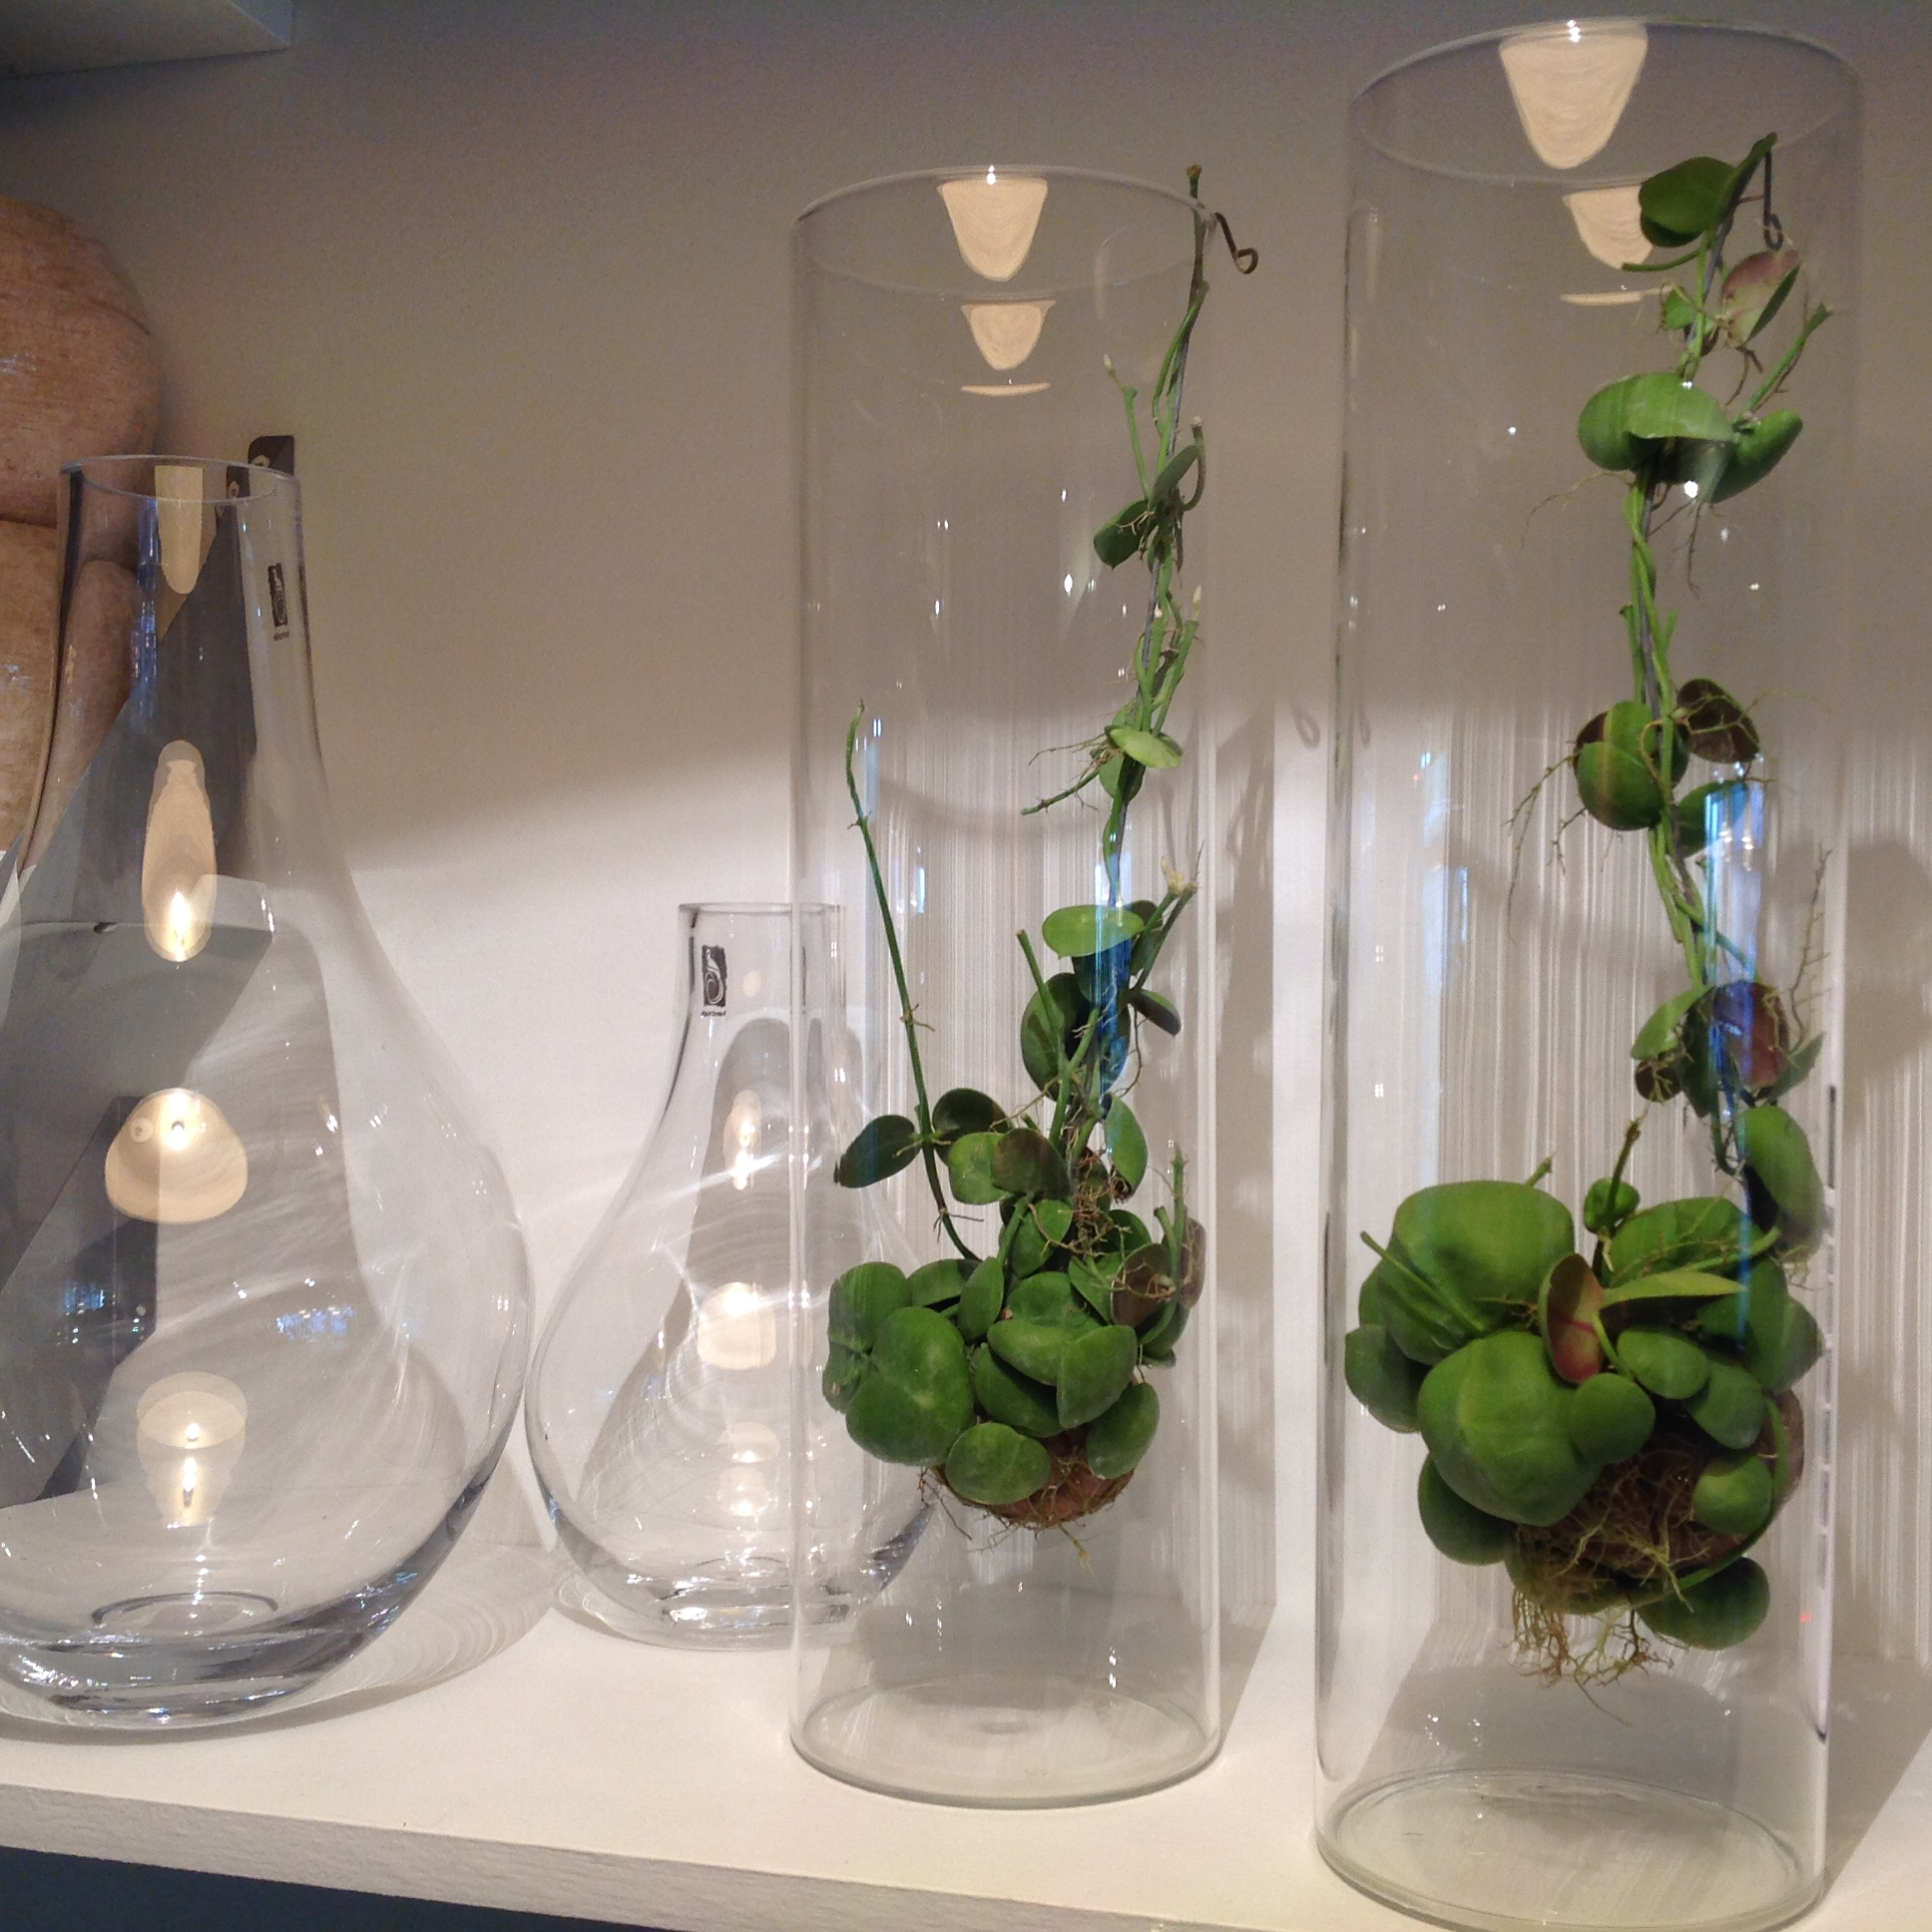 plantes en pot d 39 int rieur tentez l 39 originalit avec. Black Bedroom Furniture Sets. Home Design Ideas